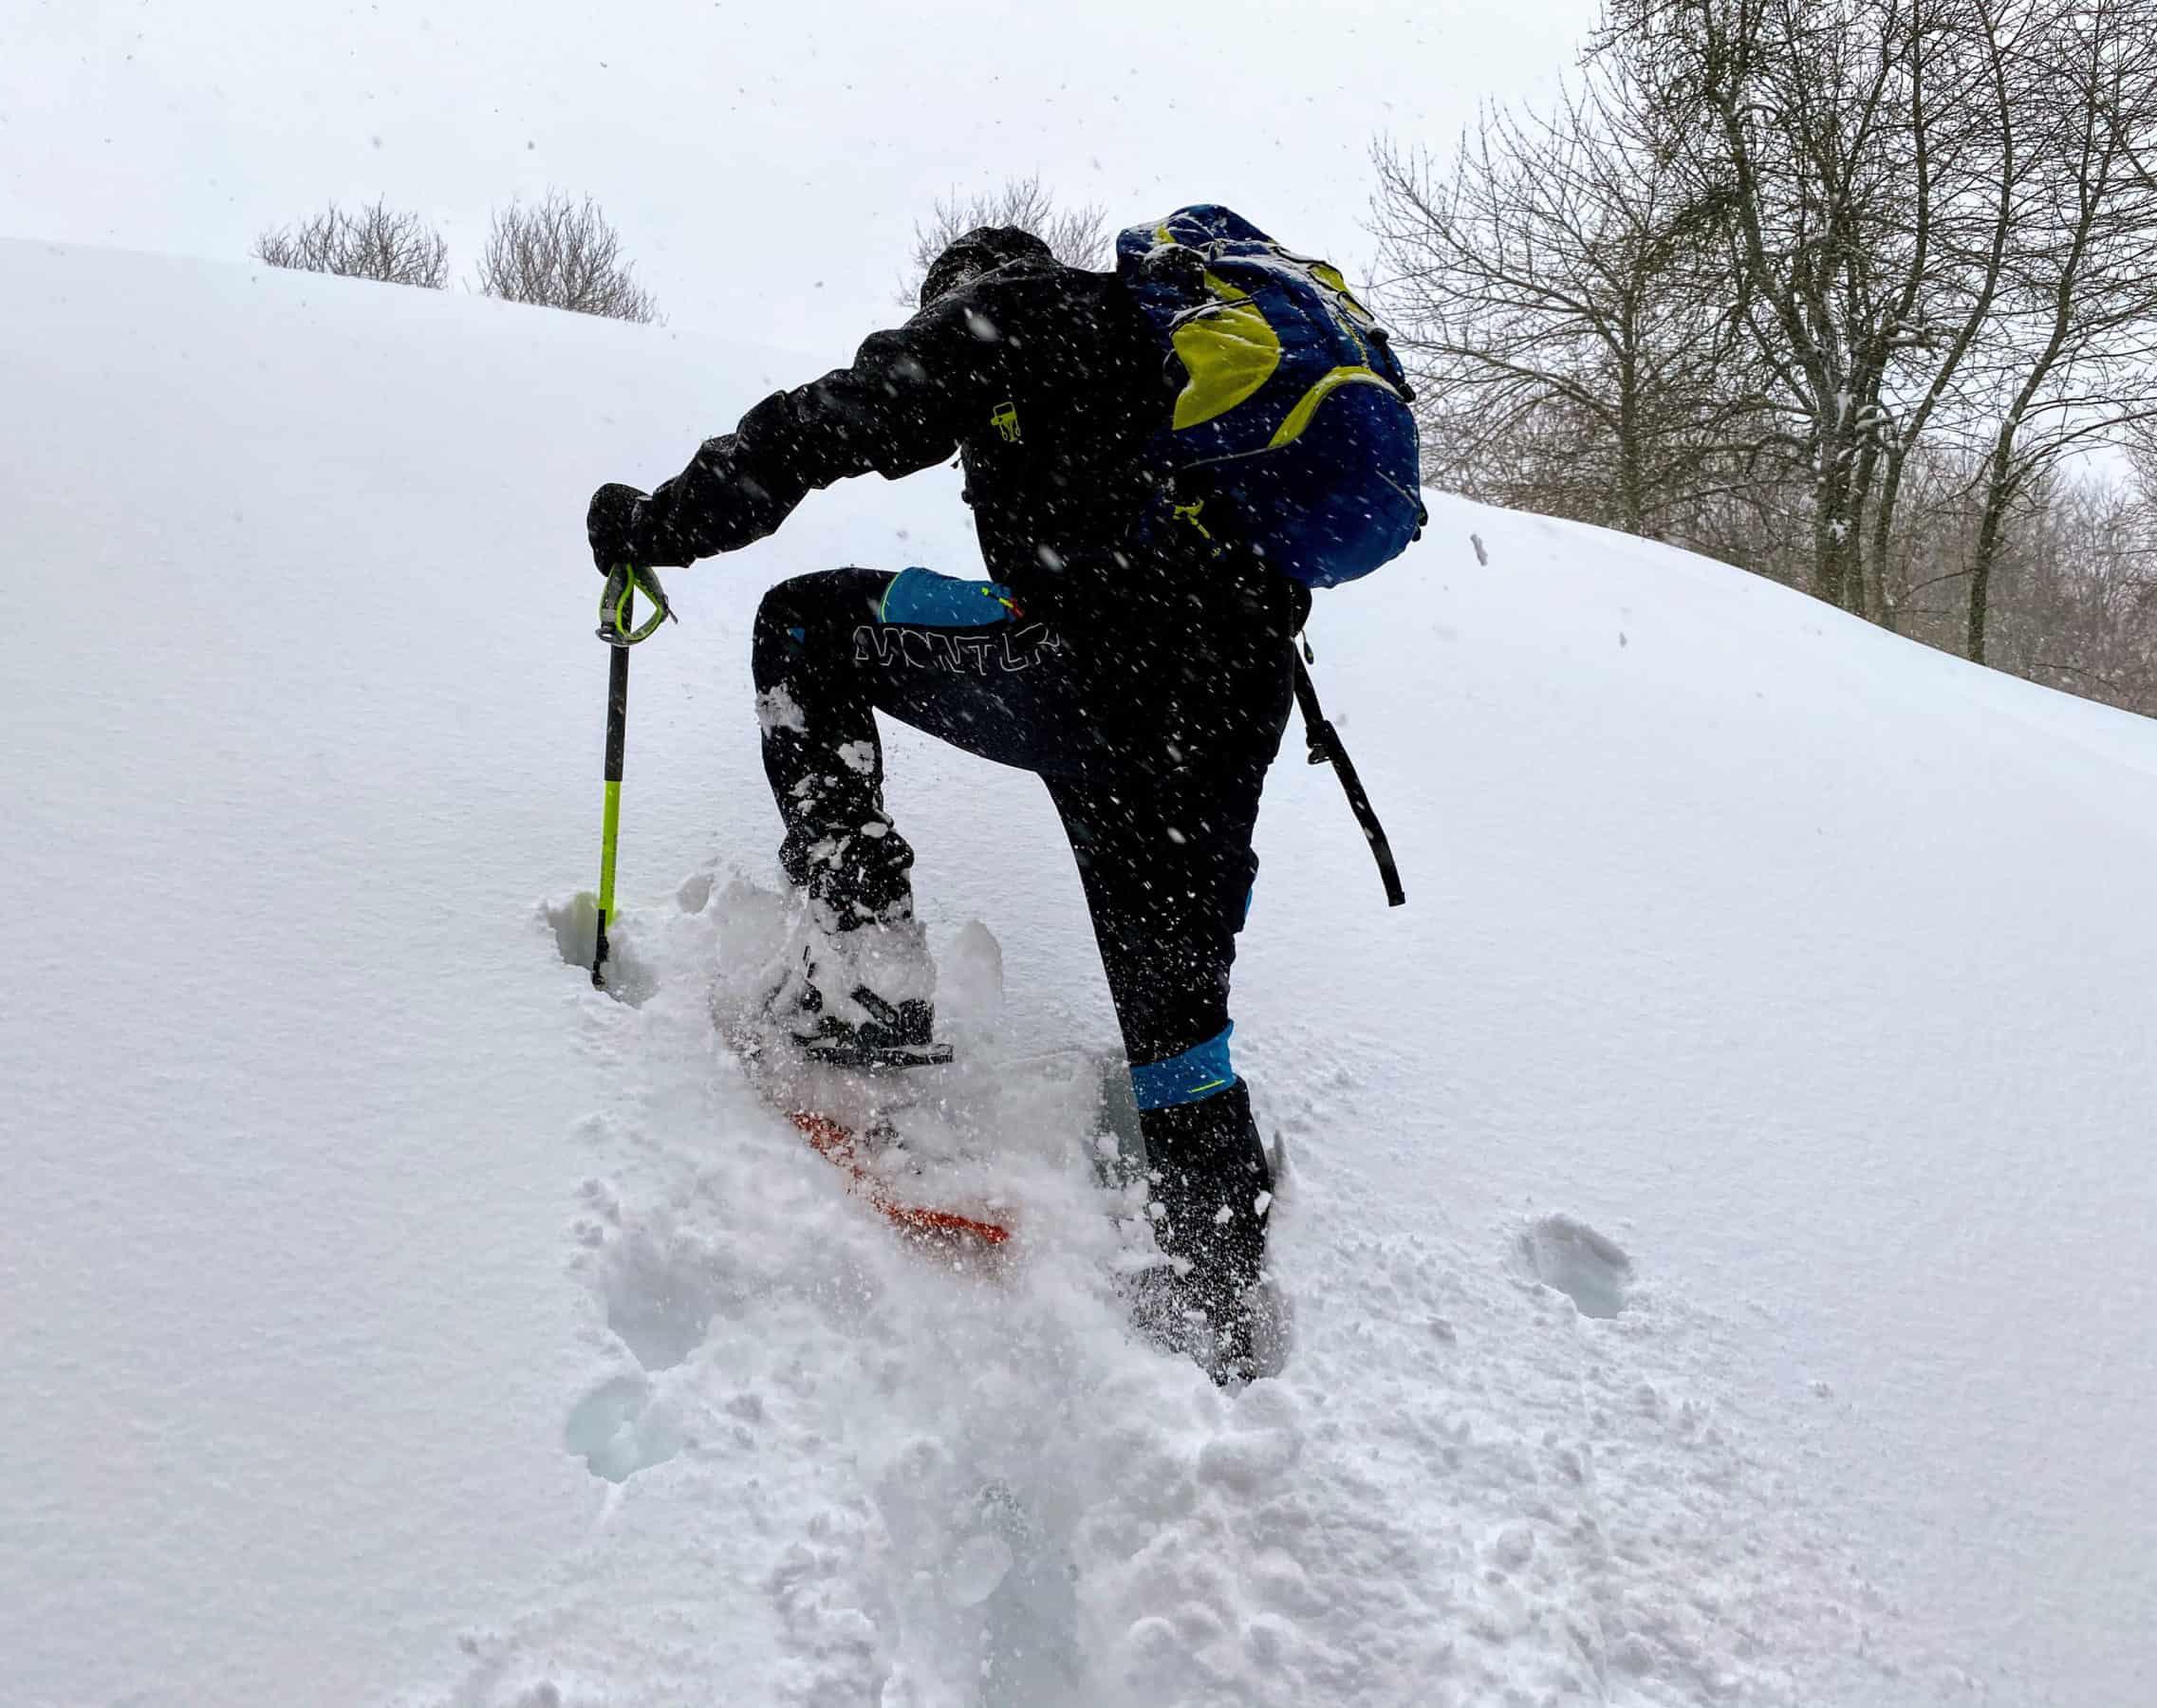 Fjällräven Expedition Lätt Hoodie, durante una ciaspolata in neve profonda